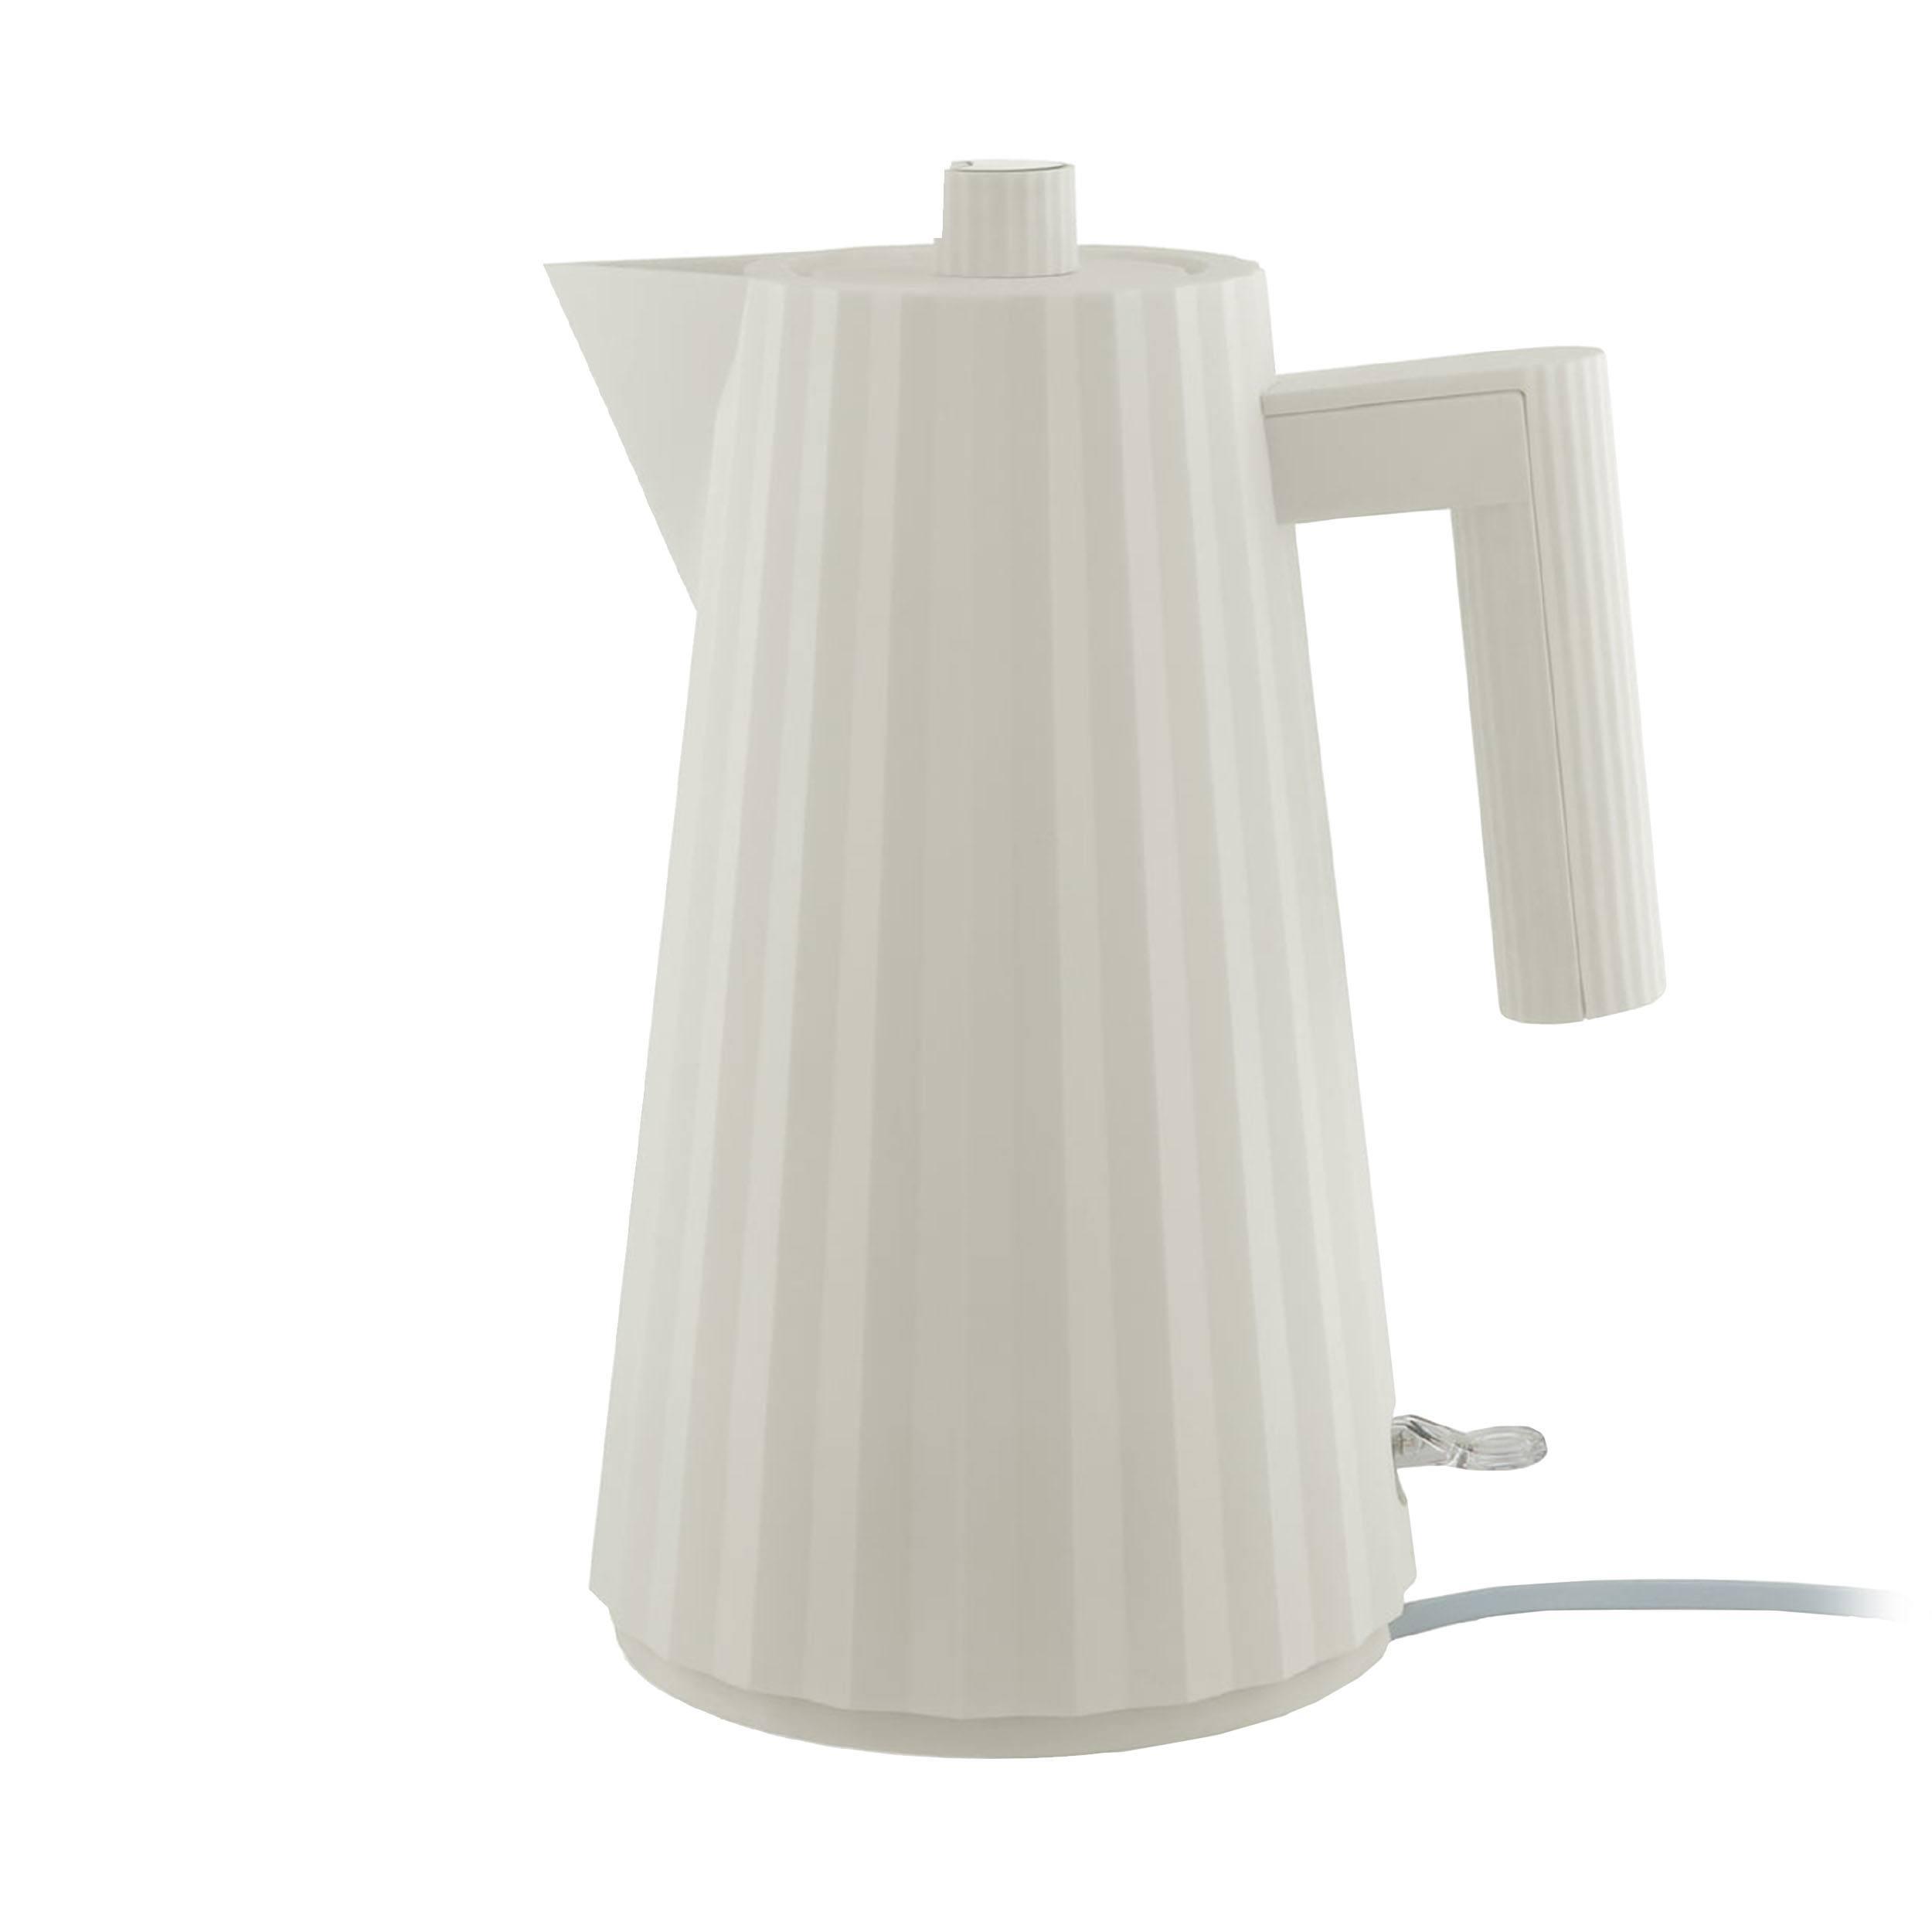 Plissé Wasserkocher